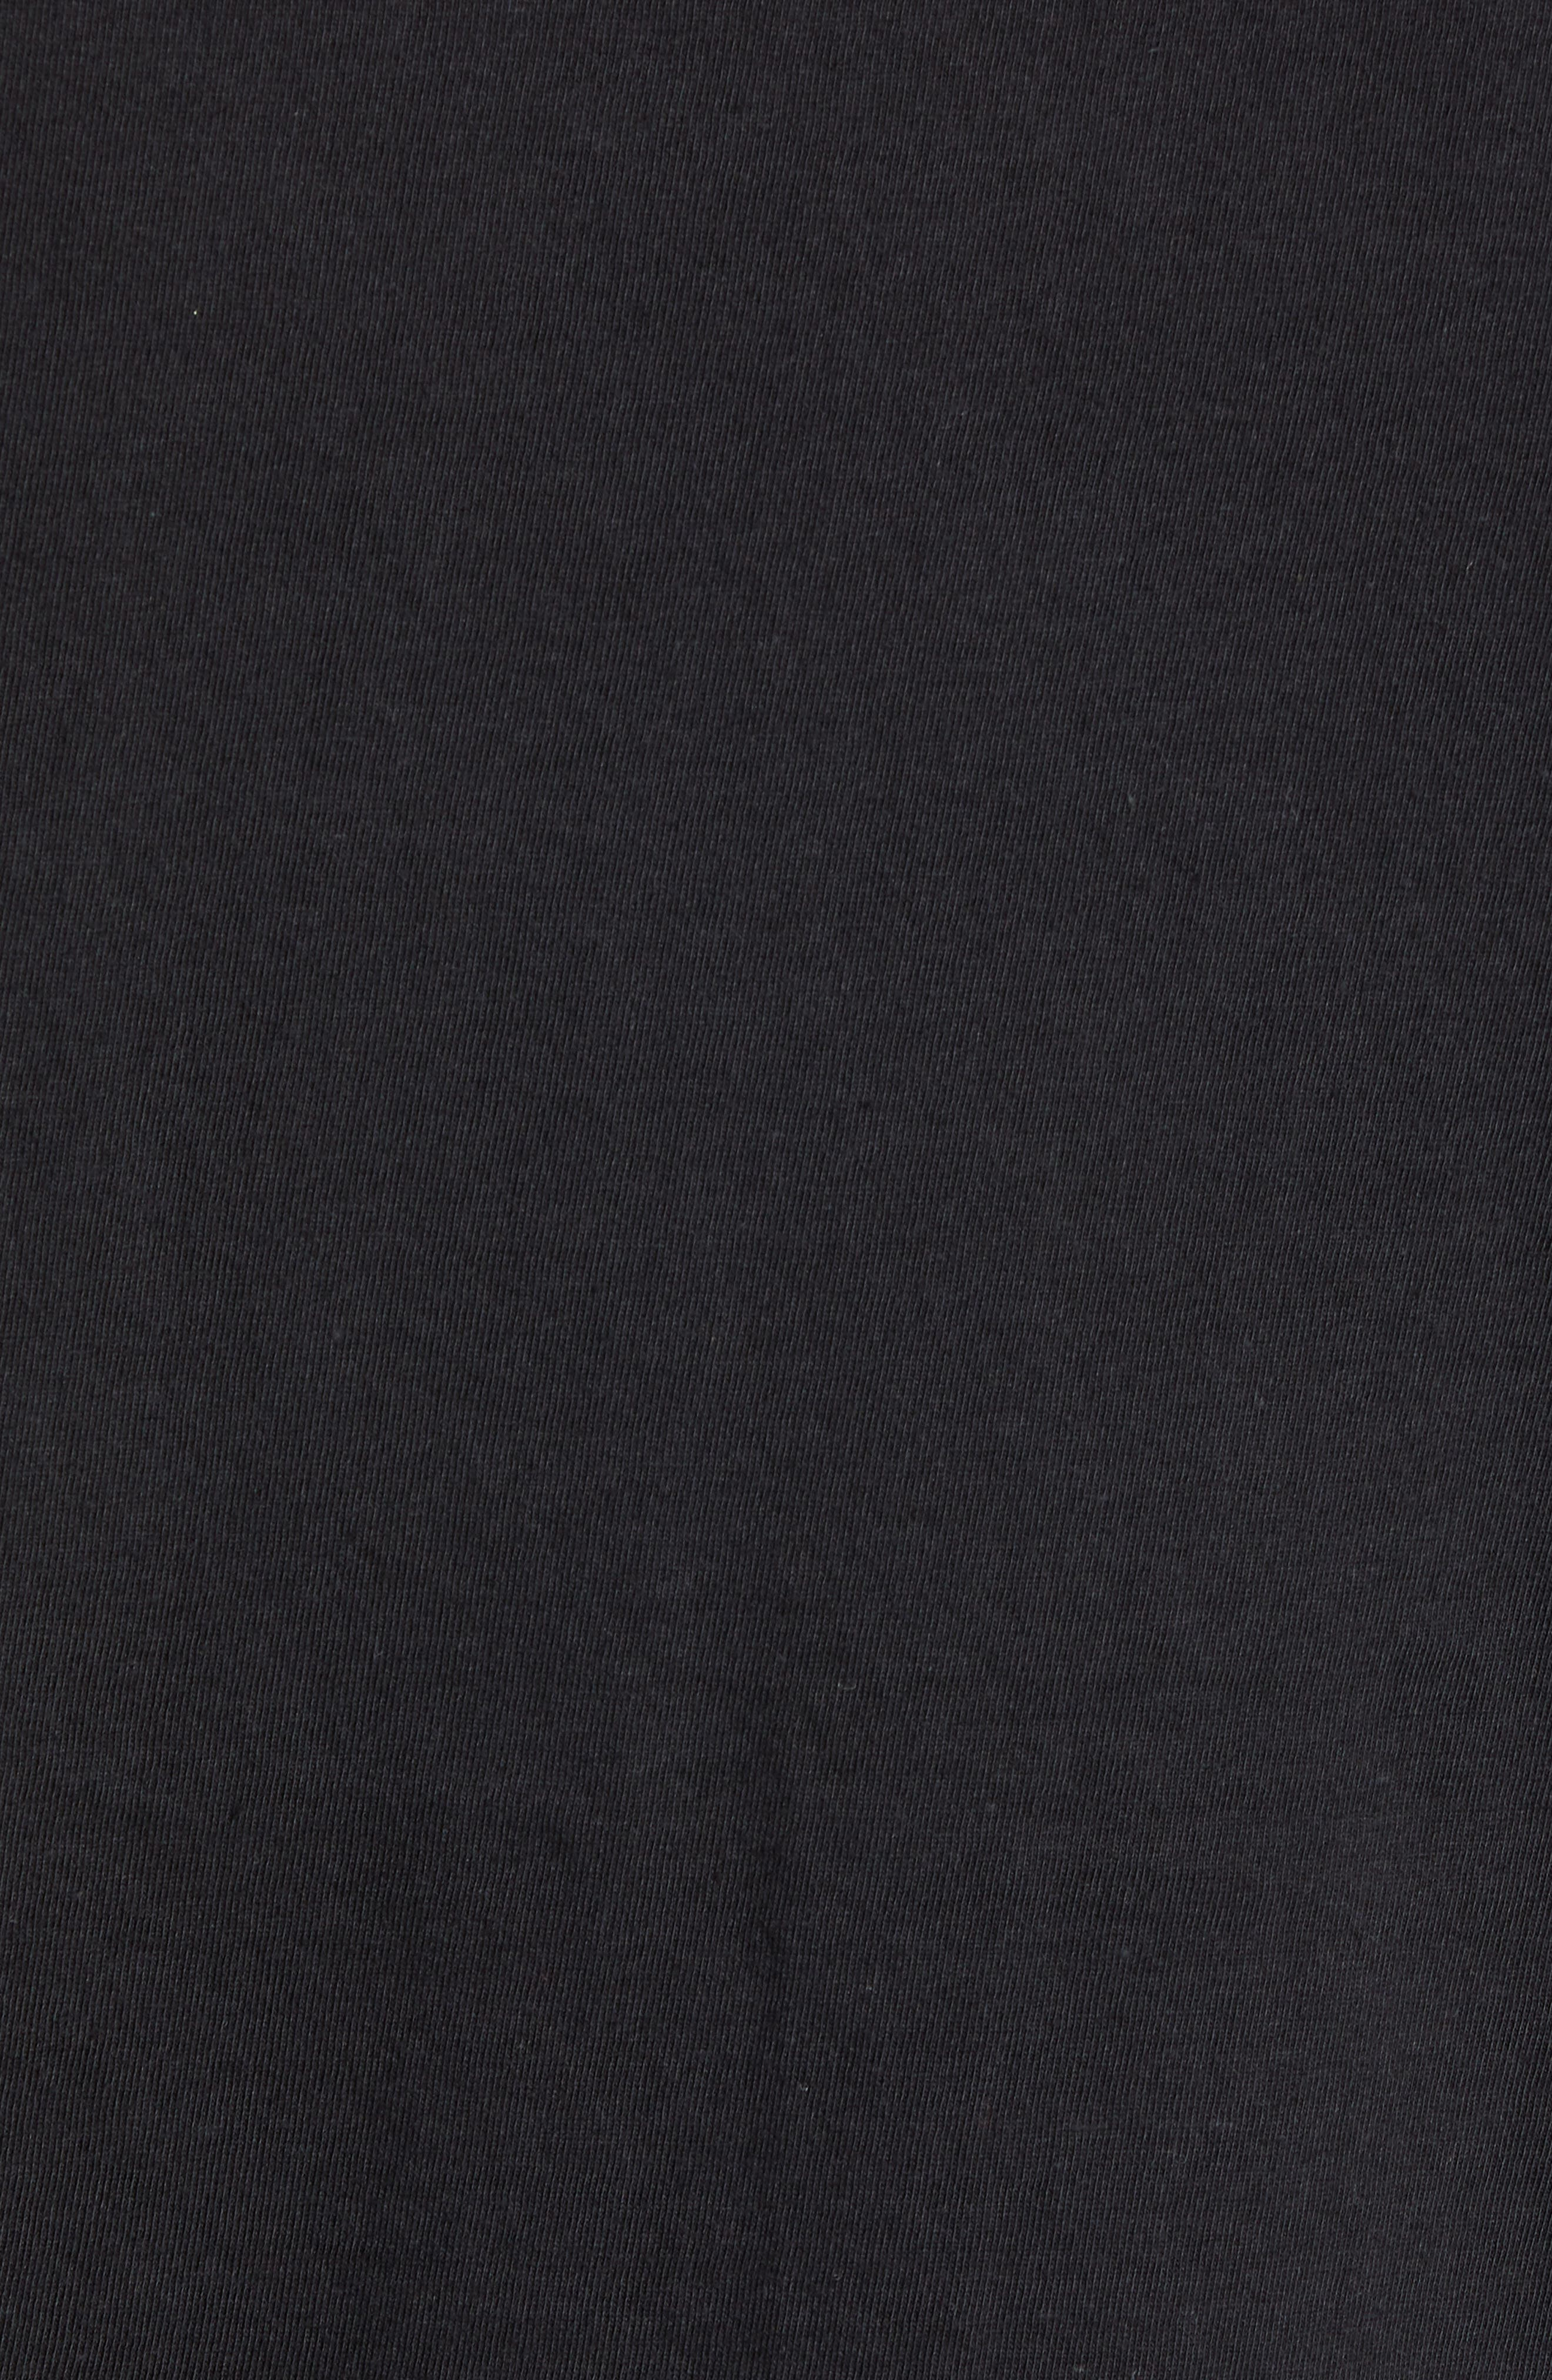 Dream Big Graphic T-Shirt,                             Alternate thumbnail 5, color,                             BLACK